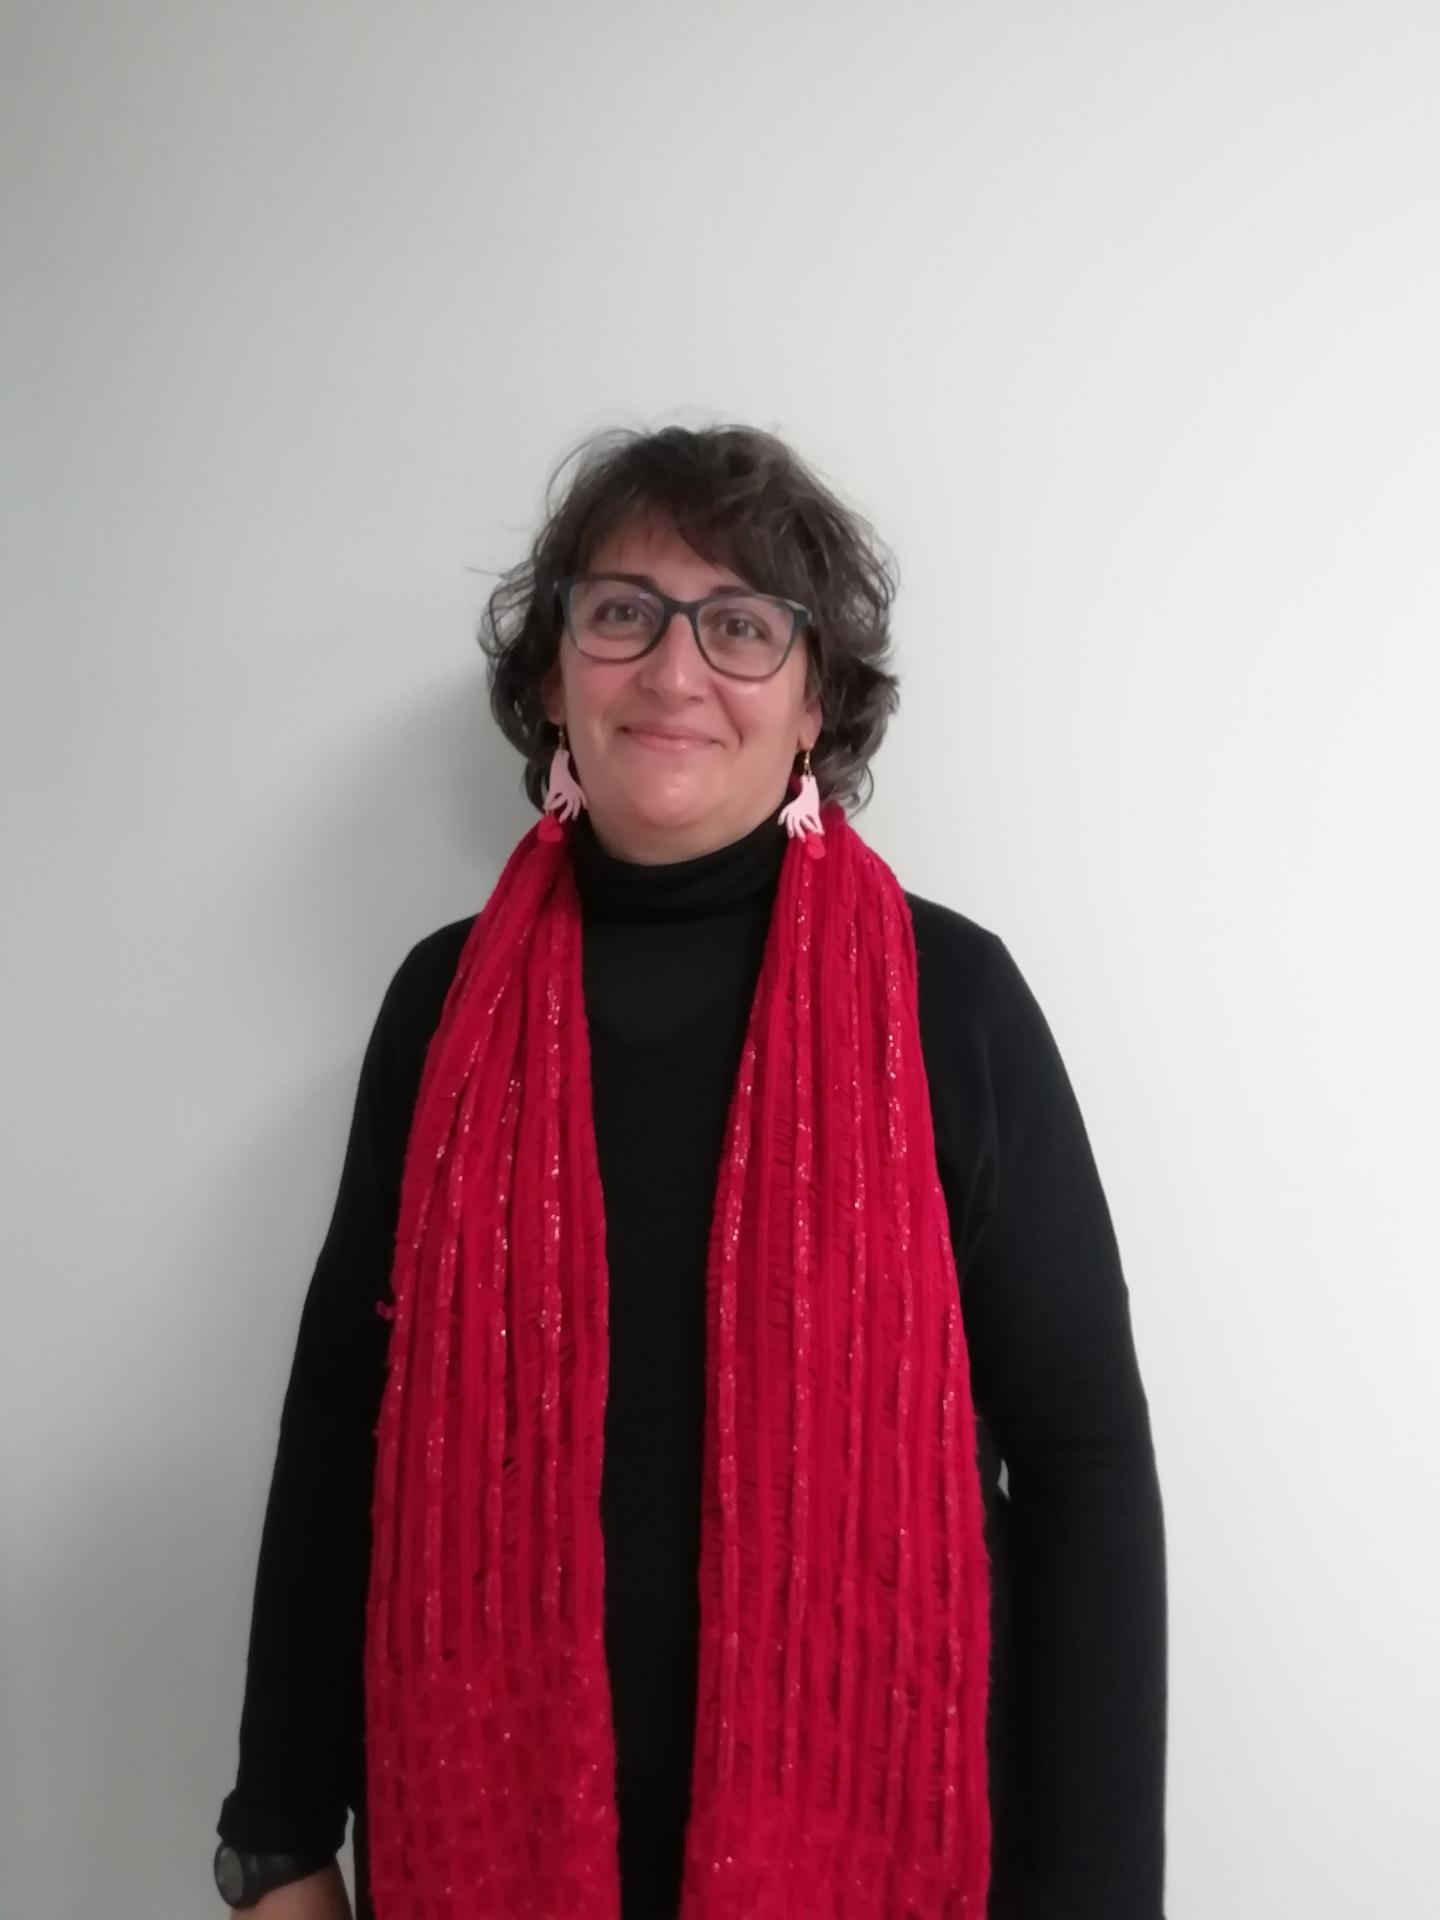 Yolanda Perelló Alonso